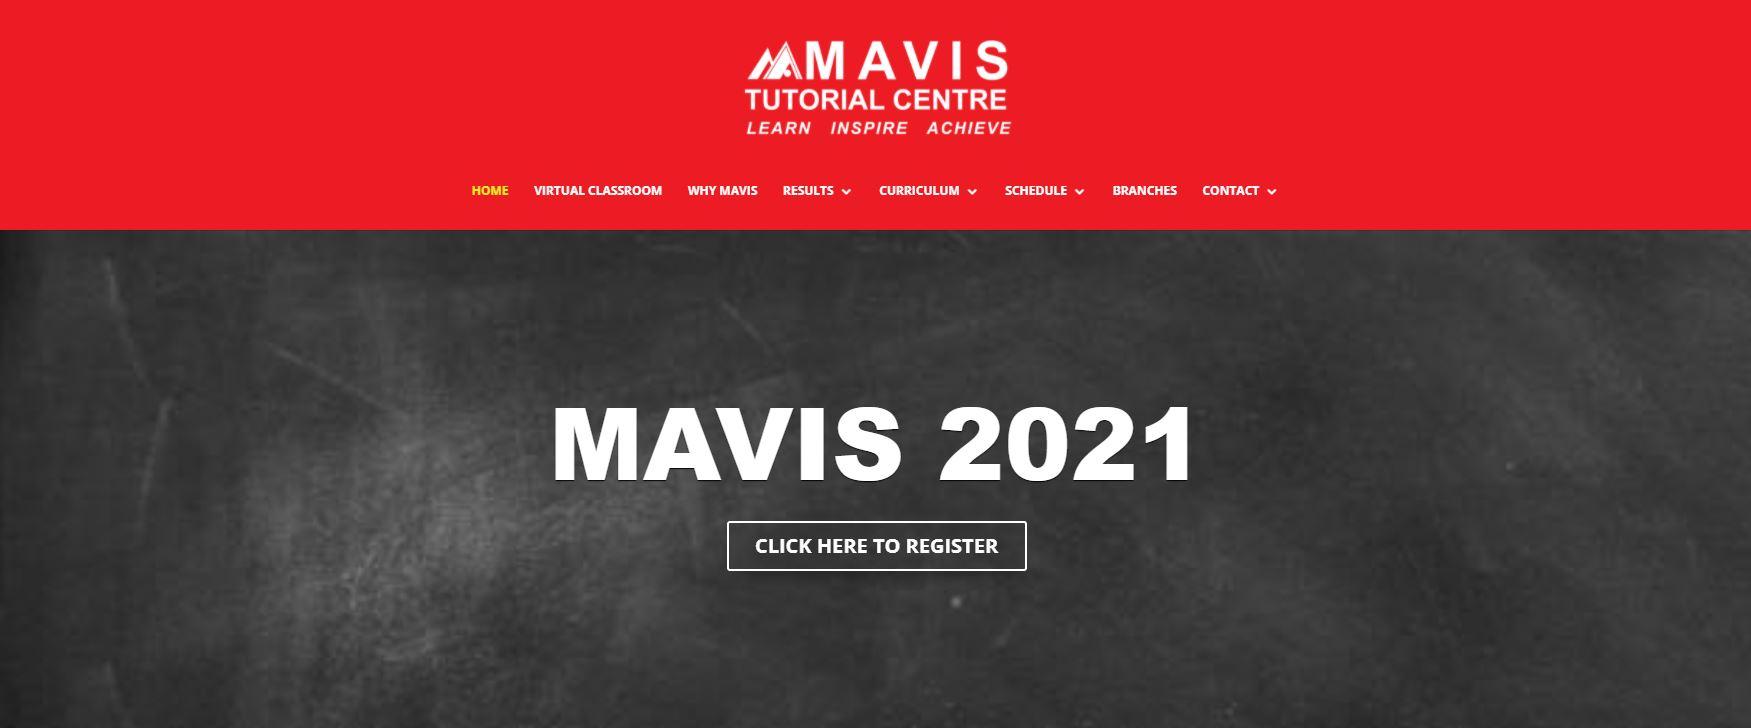 Mavis-Tutorial-Centre-Maths-Tuition